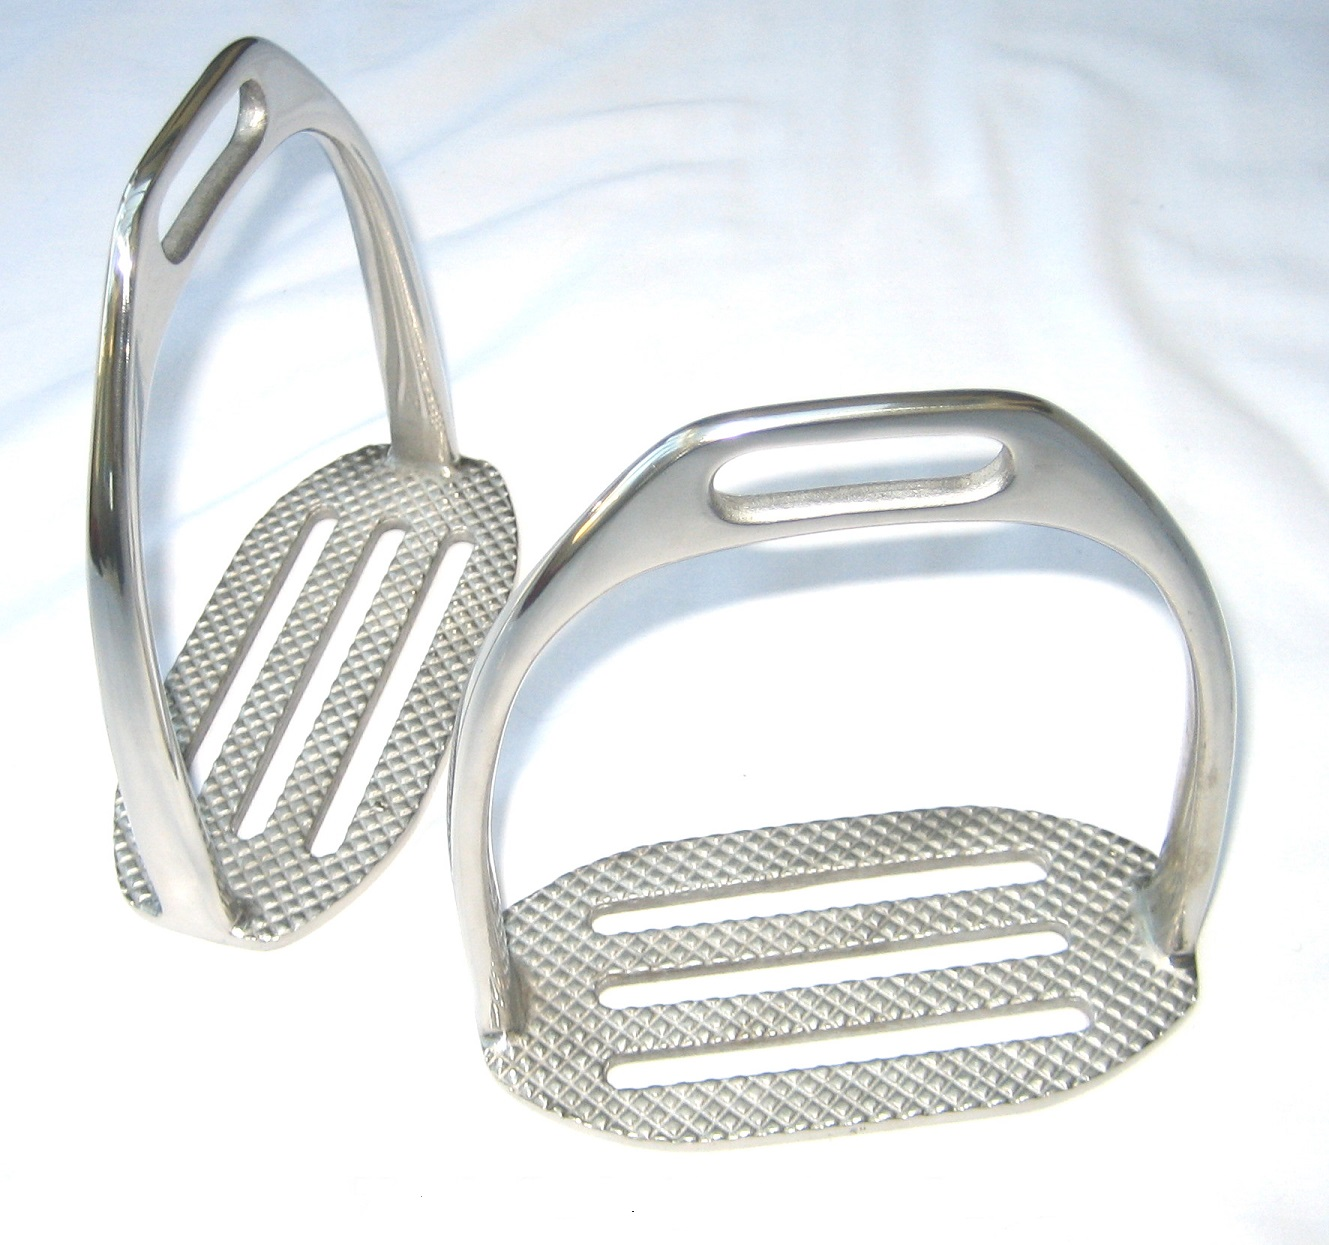 'Australian' Stirrup Irons